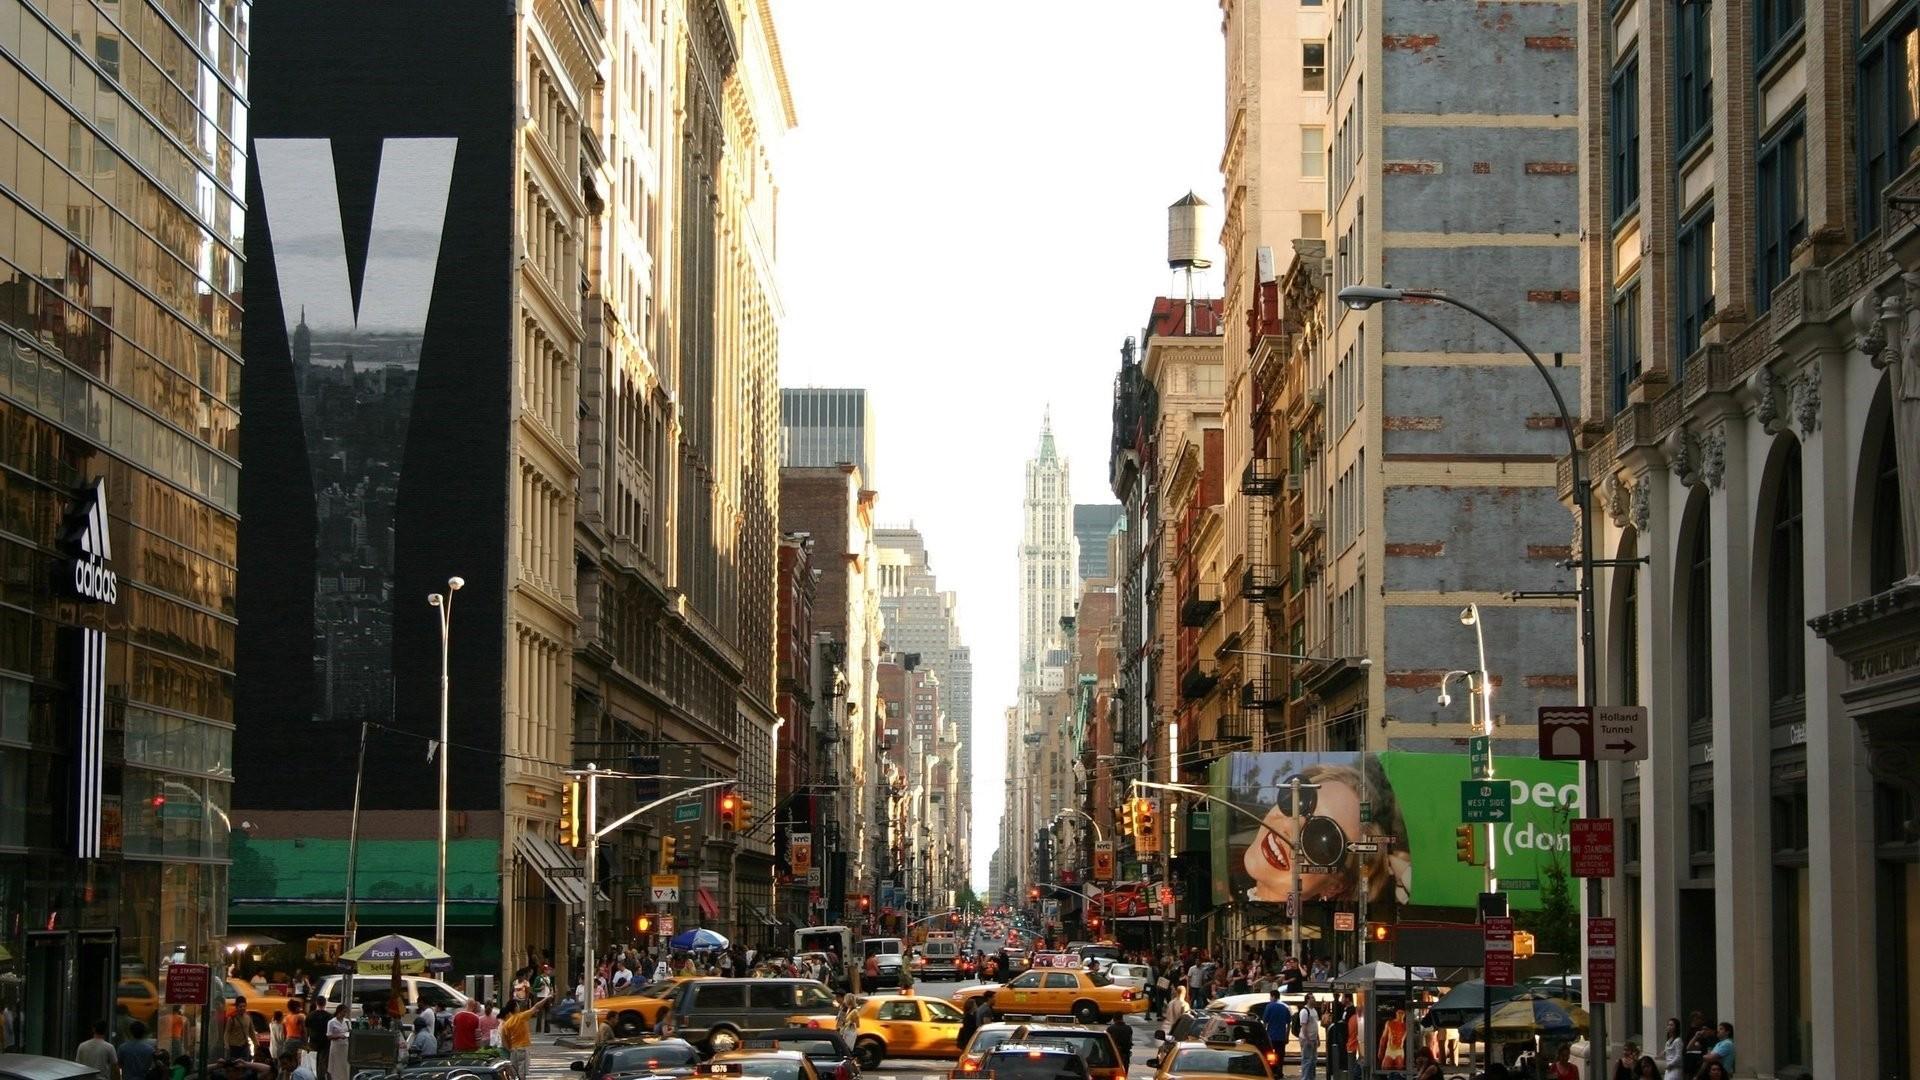 New York Street Wallpaper Picture hd